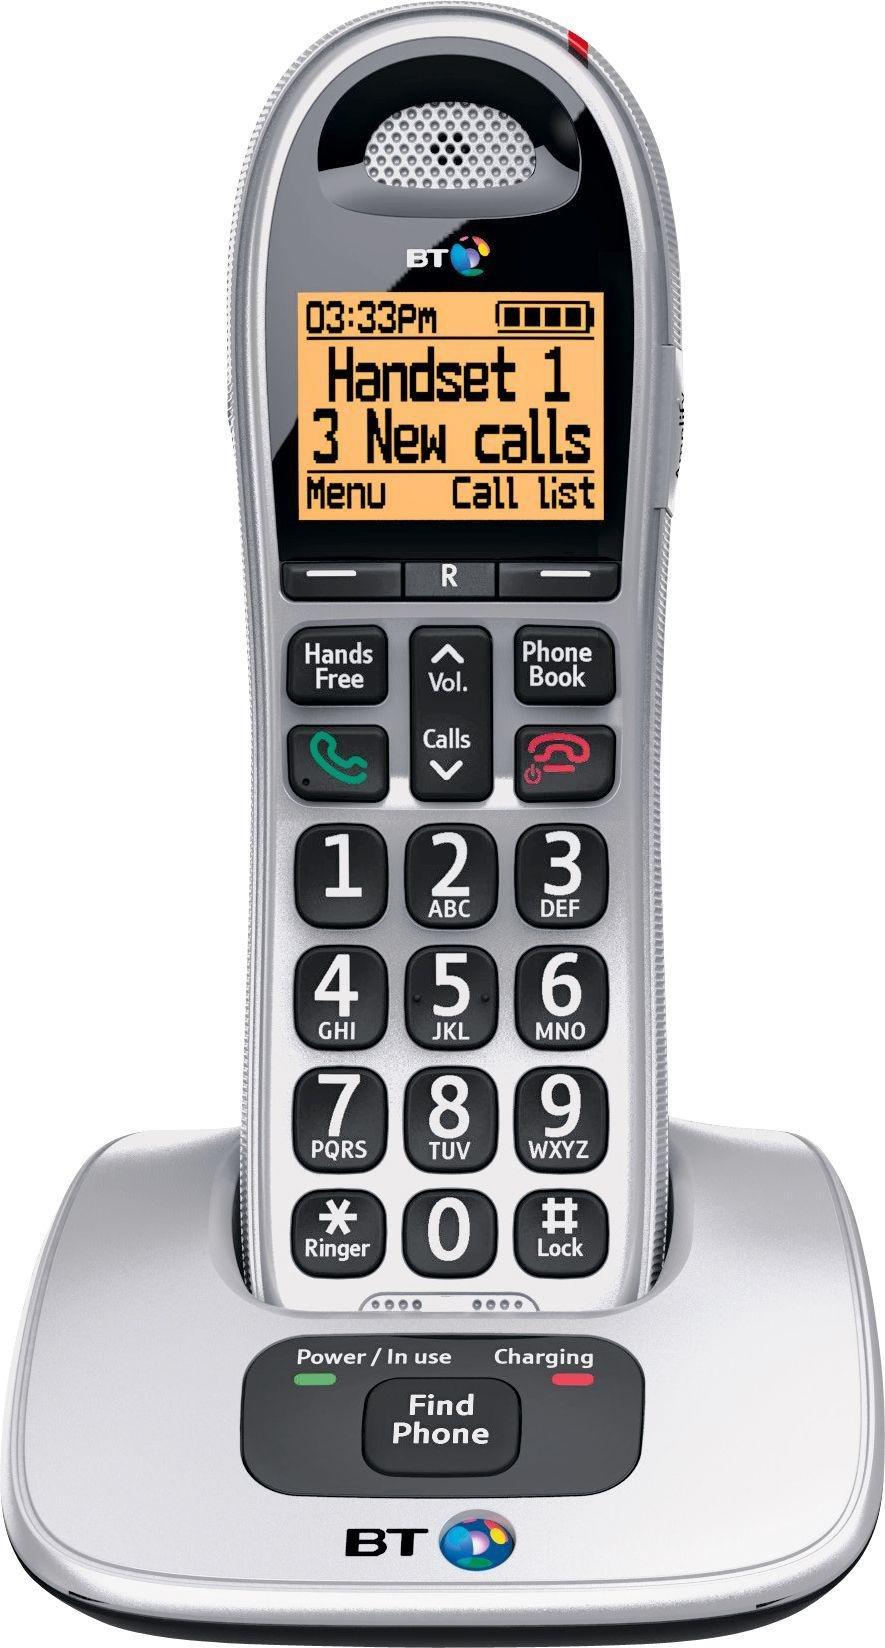 BT BT - Big Button 4000 - Cordless Telephone - Single